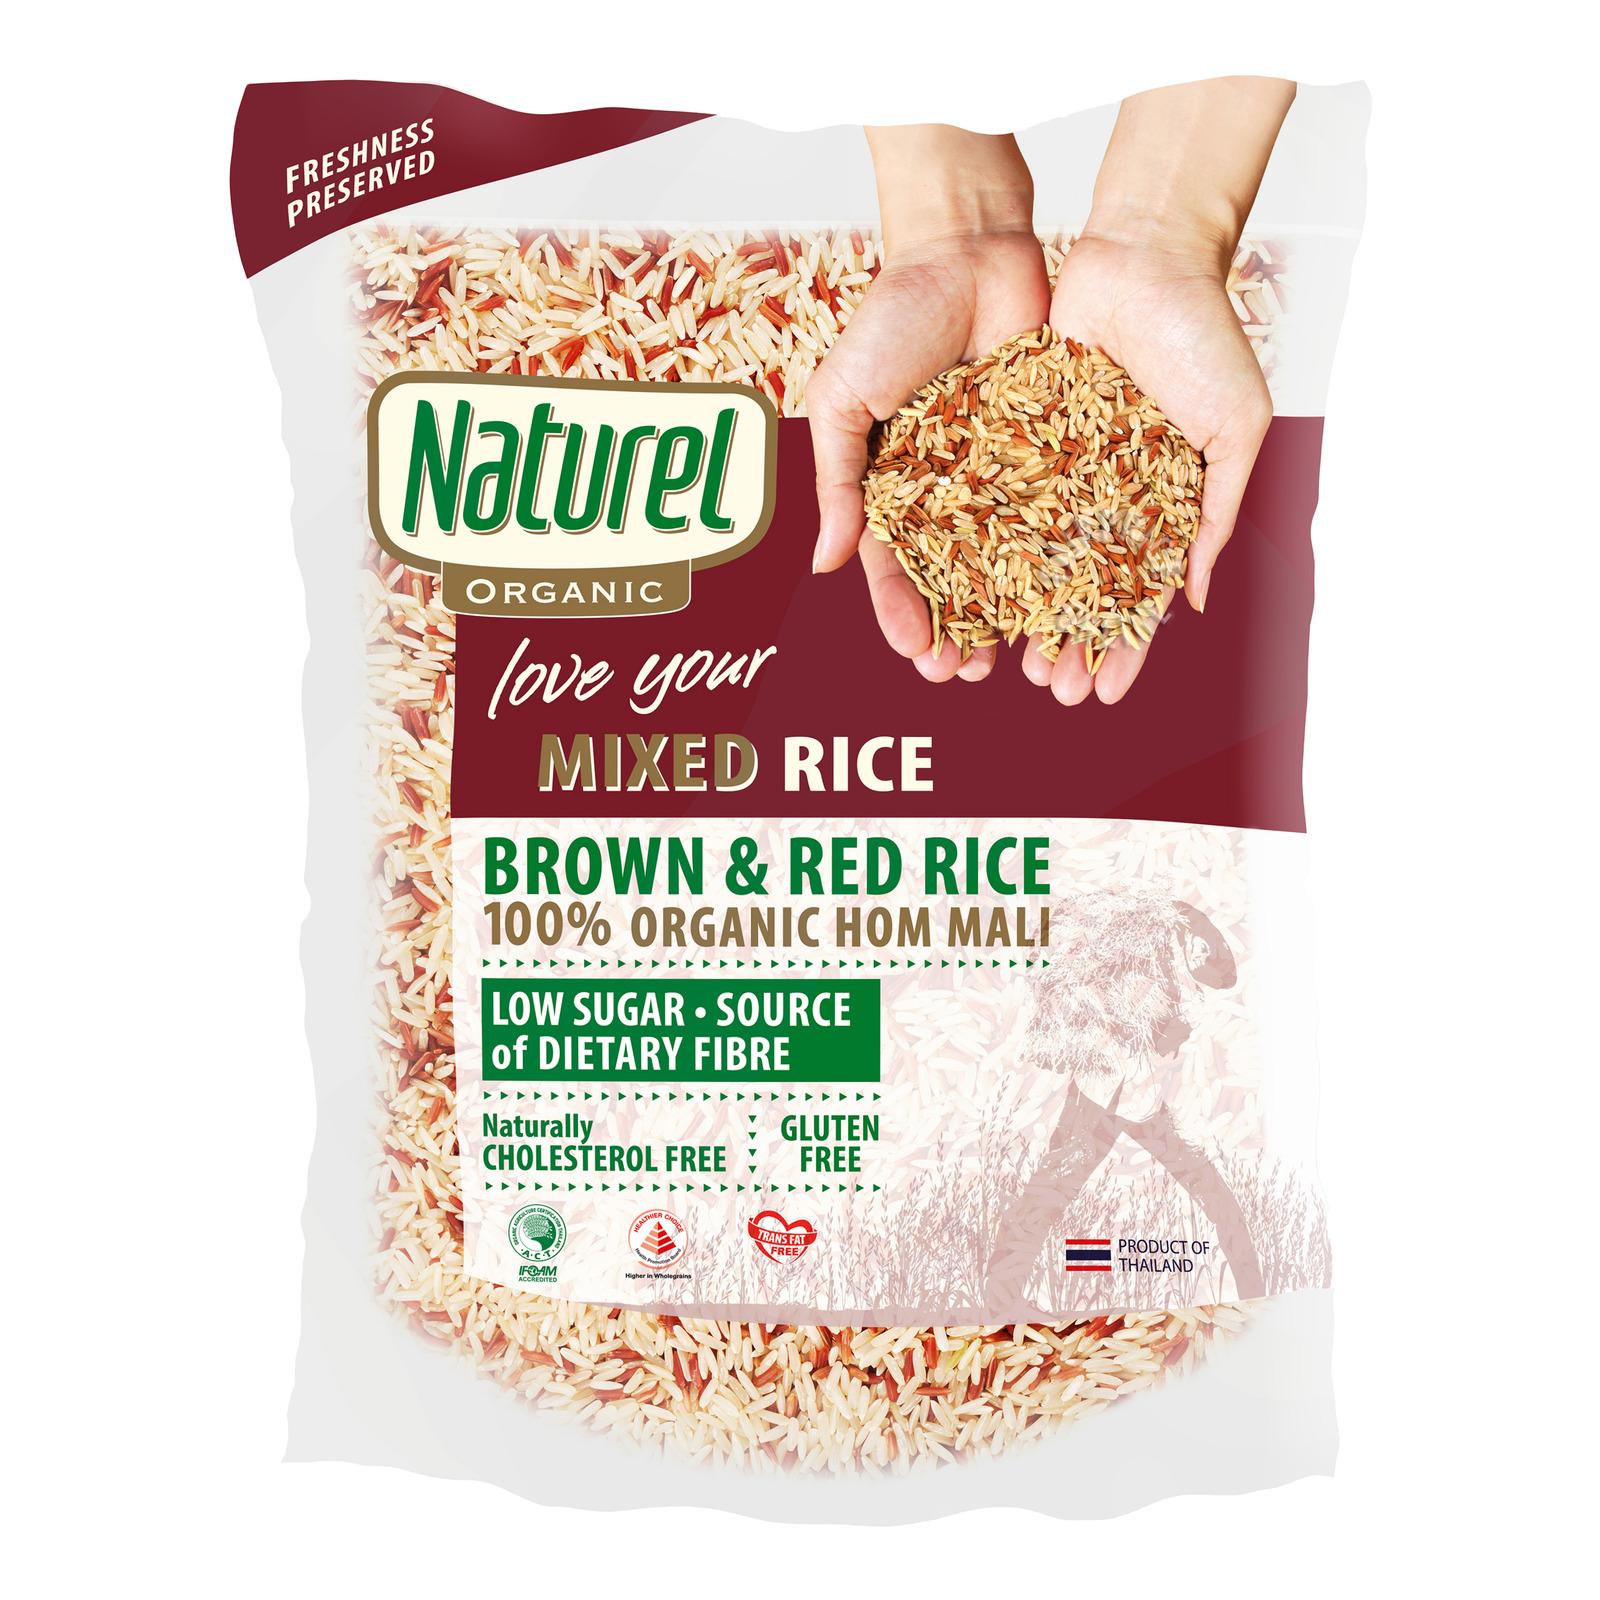 Naturel Organic Rice - Mixed Brown and Red